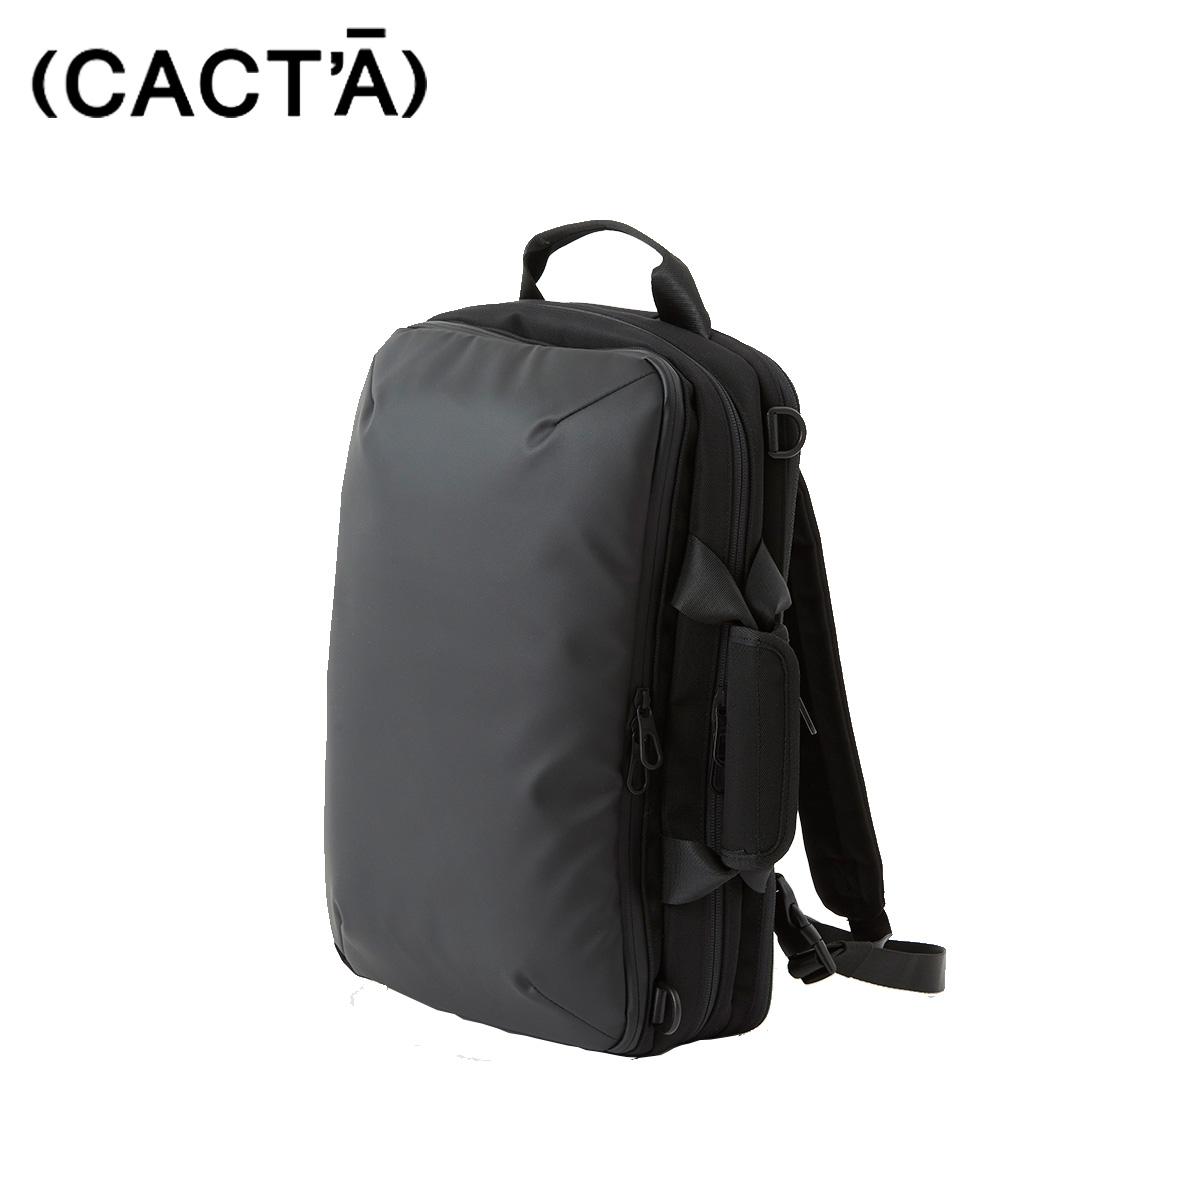 CACTA COLON 3WAY BUSINESS BAG カクタ リュック バッグ バックパック メンズ ブラック 黒 1006